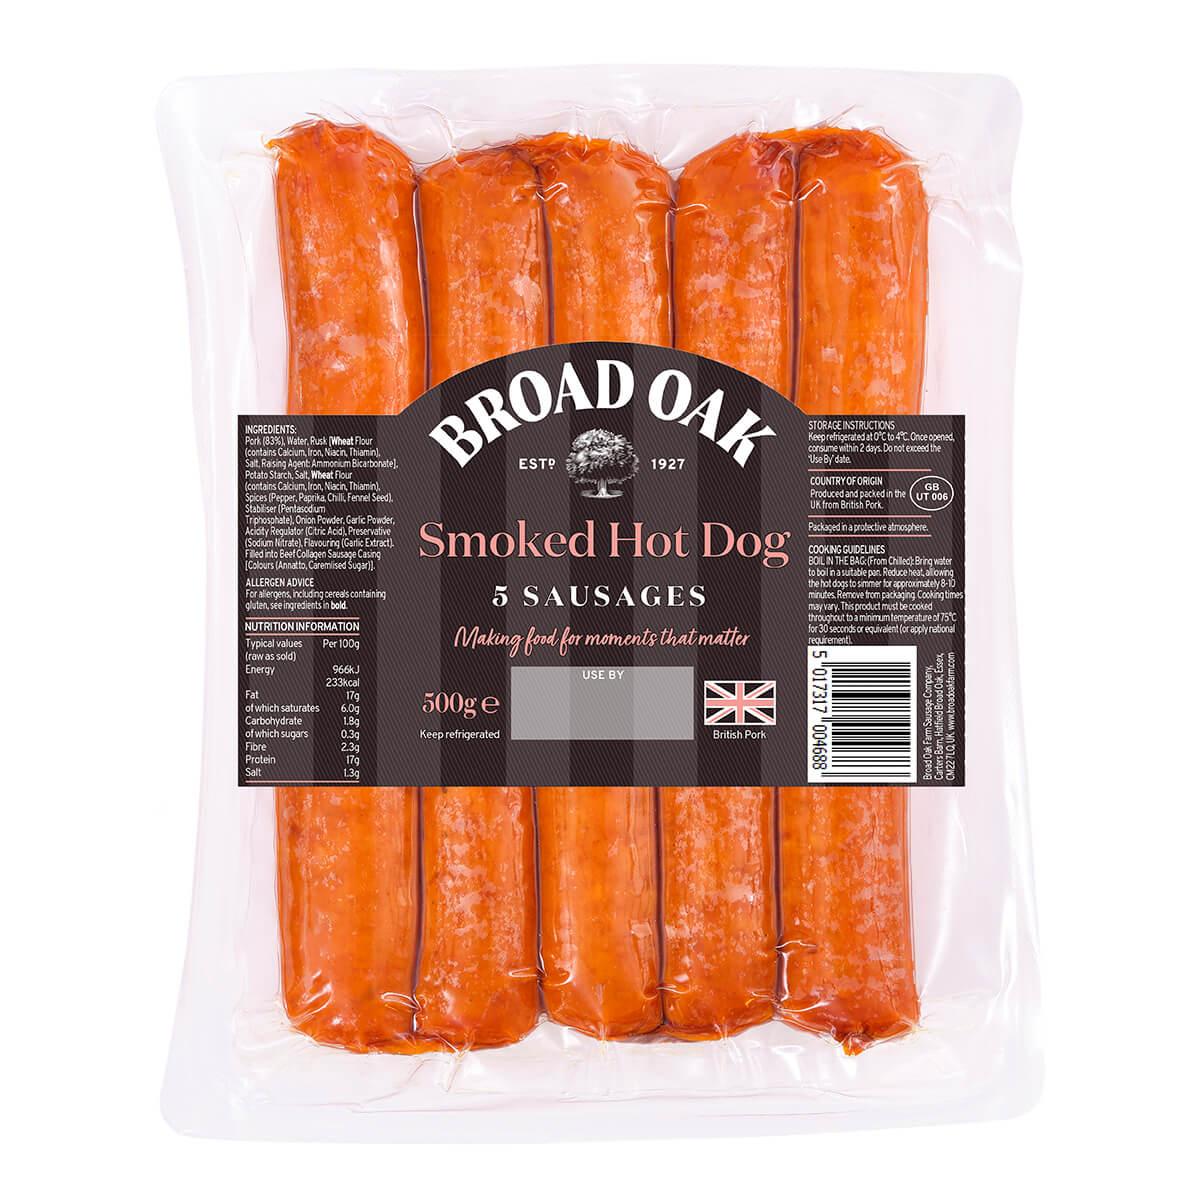 British Hot Dogs (240g)